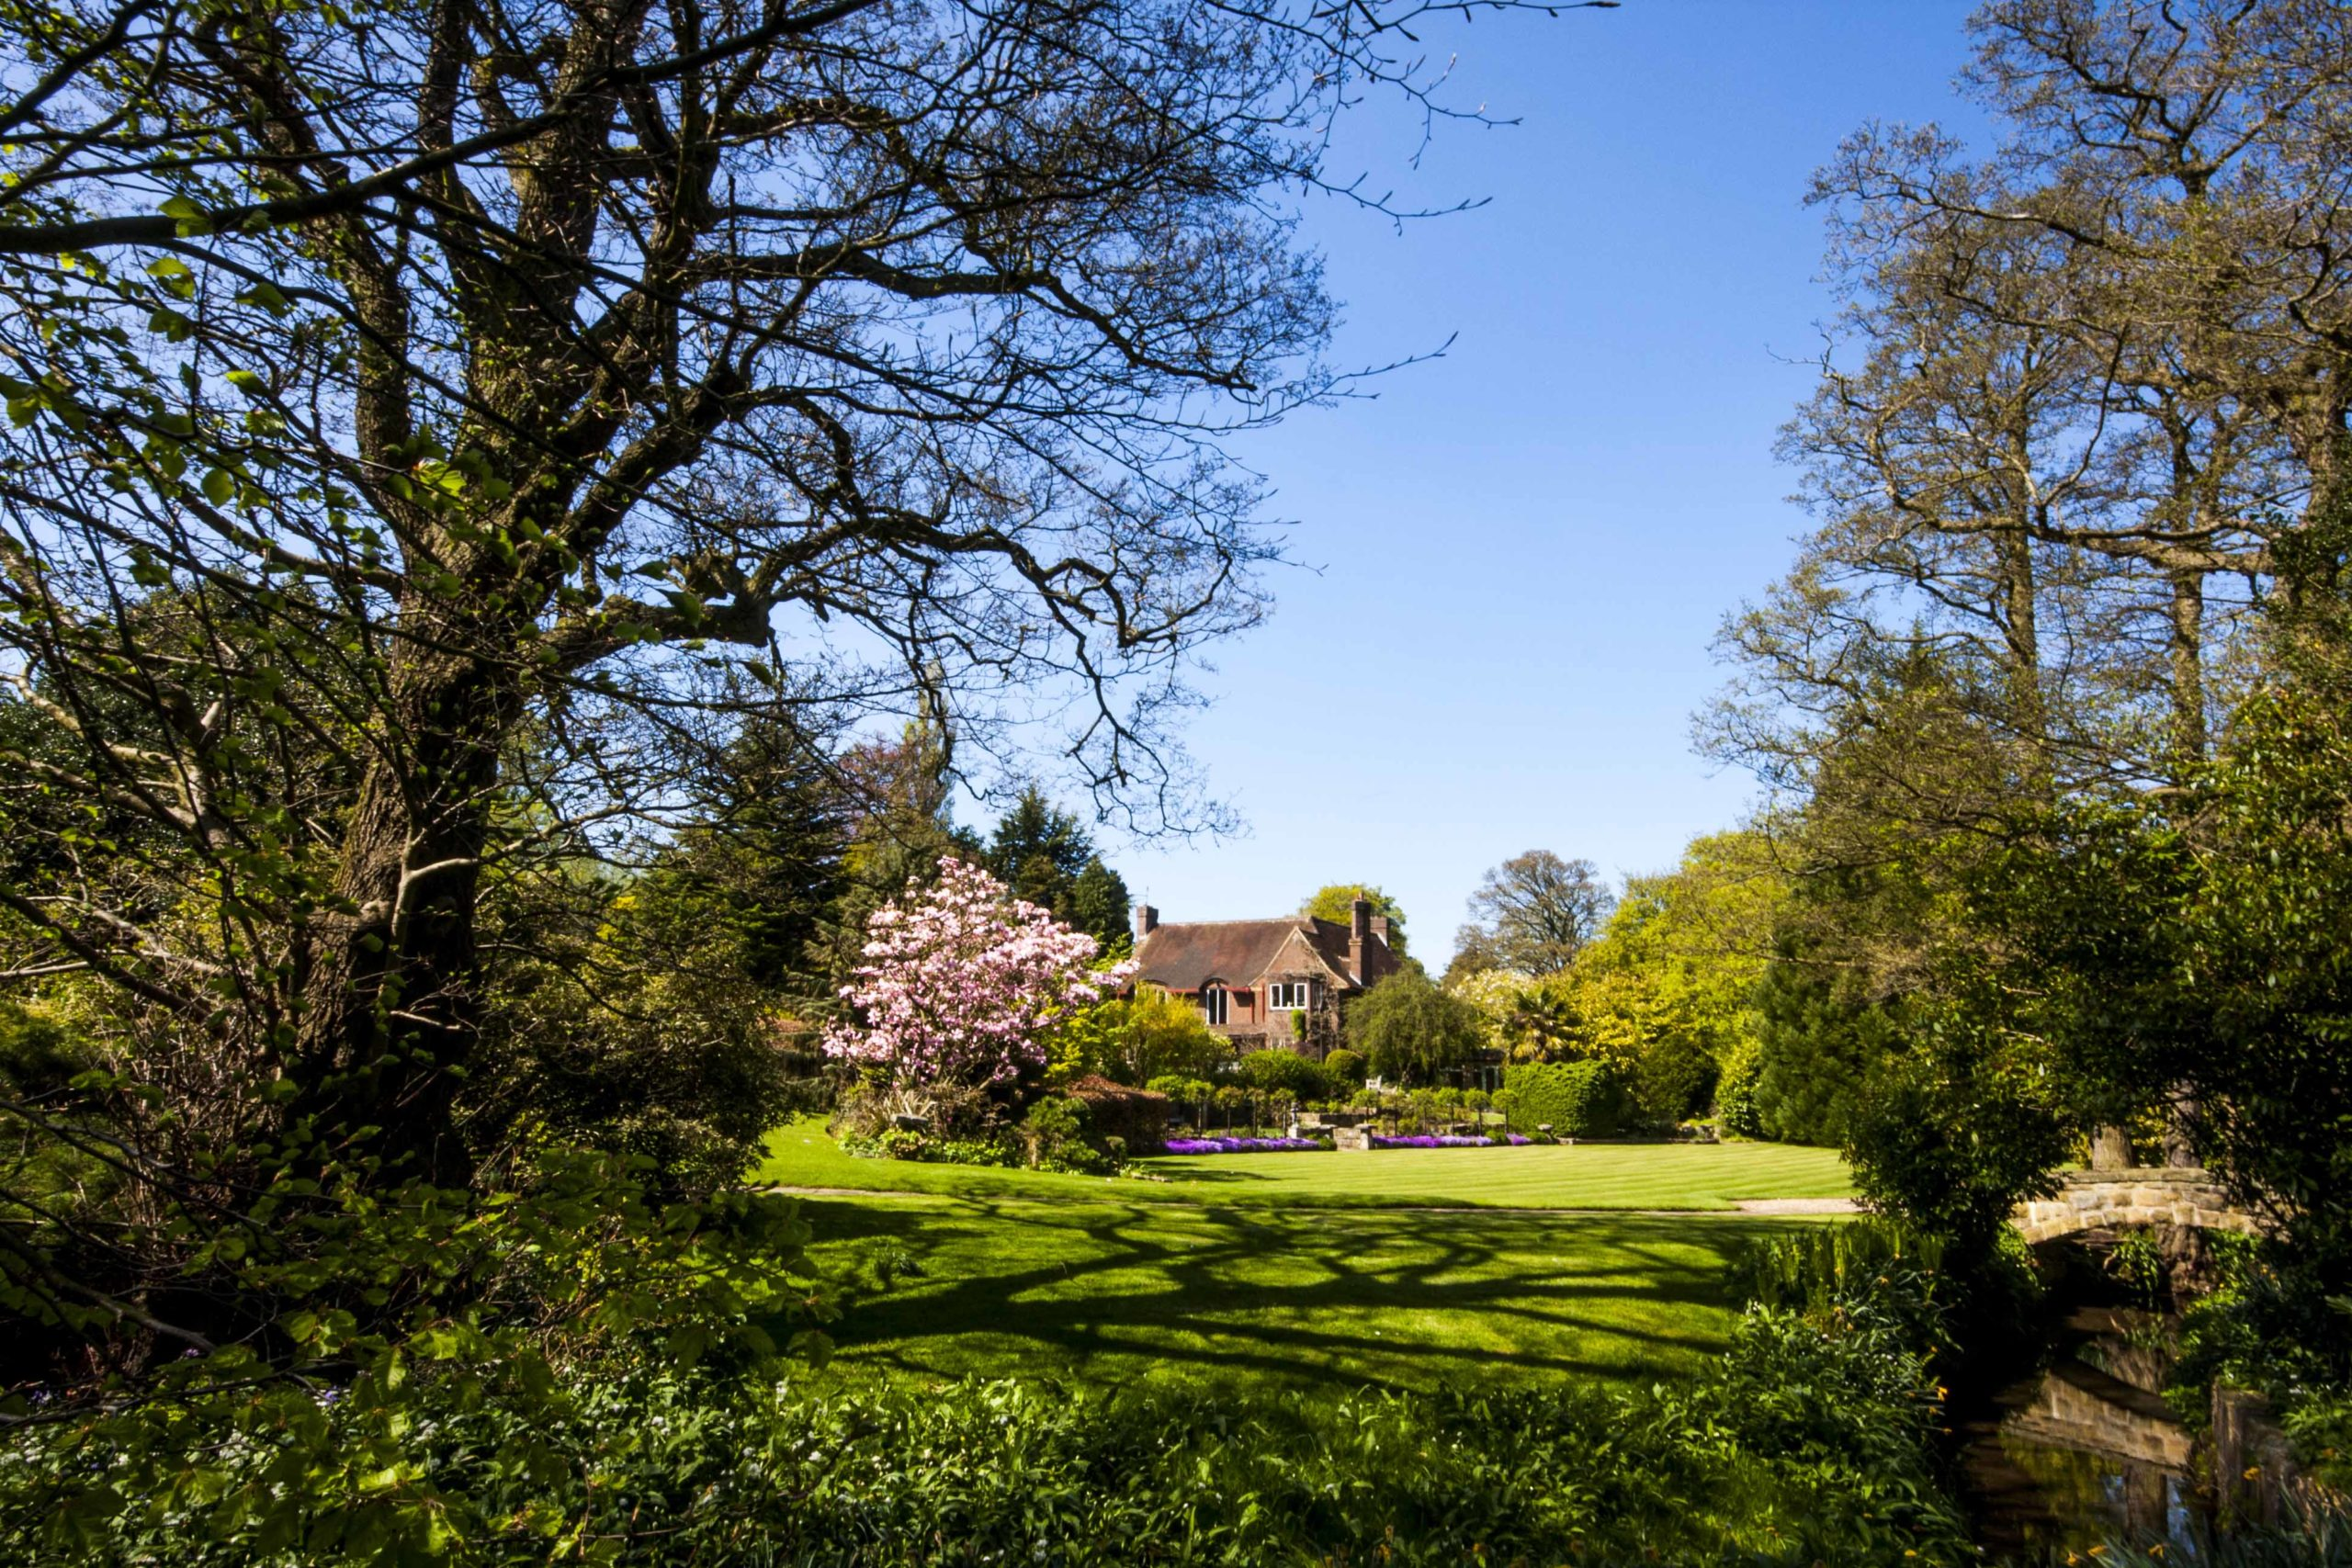 Tudor Croft Gardens, Guisborough – Photo by Dom Finn